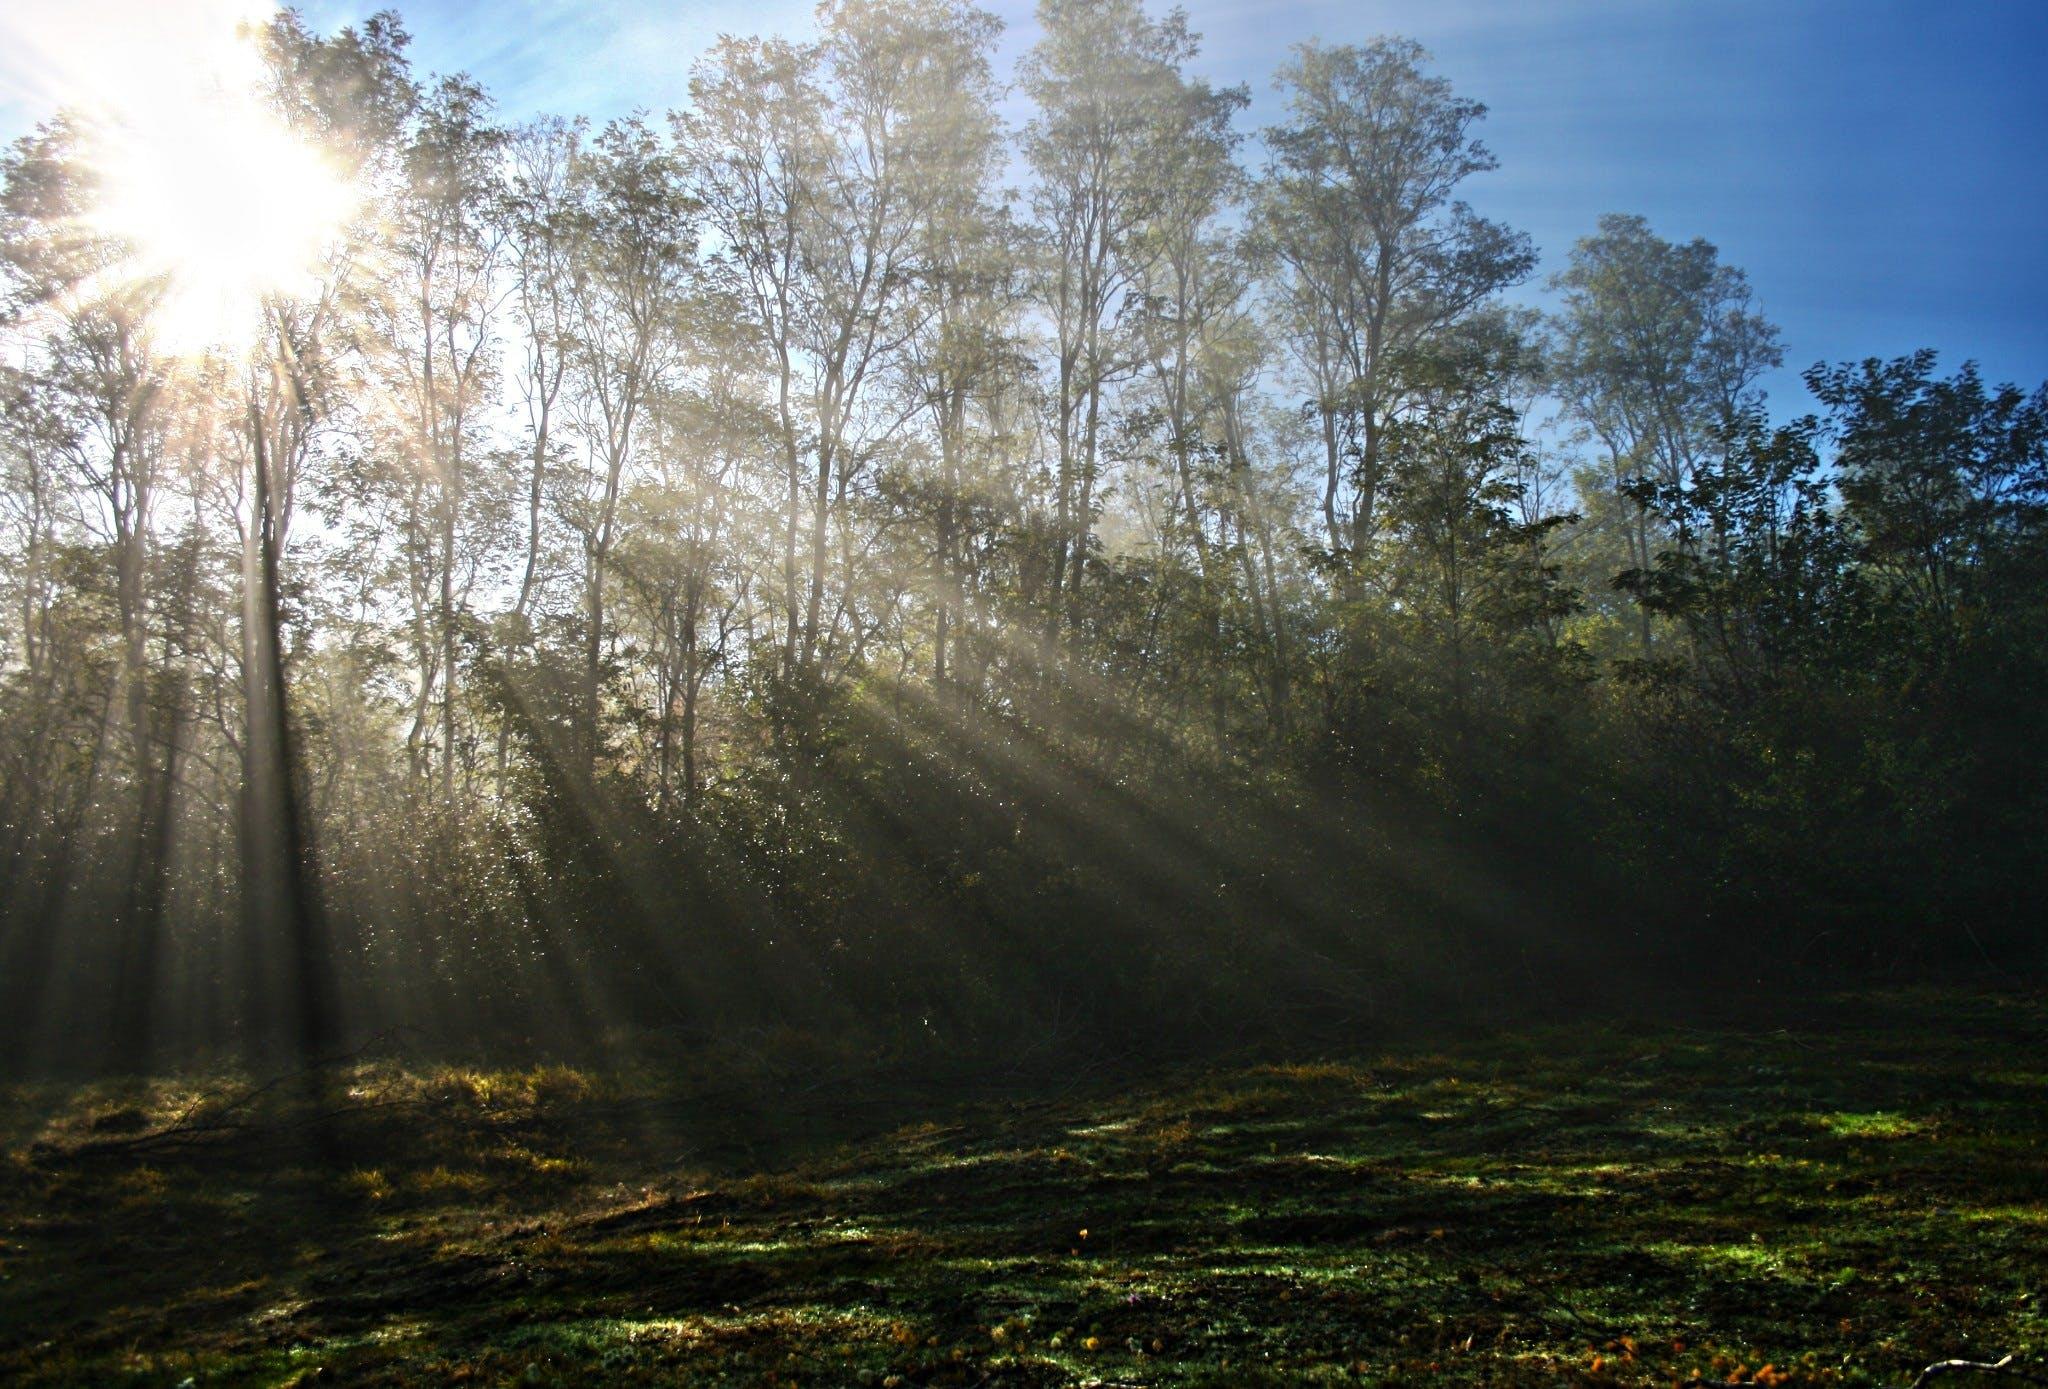 Sunlight Piercing Through Green Tall Trees during Daytime